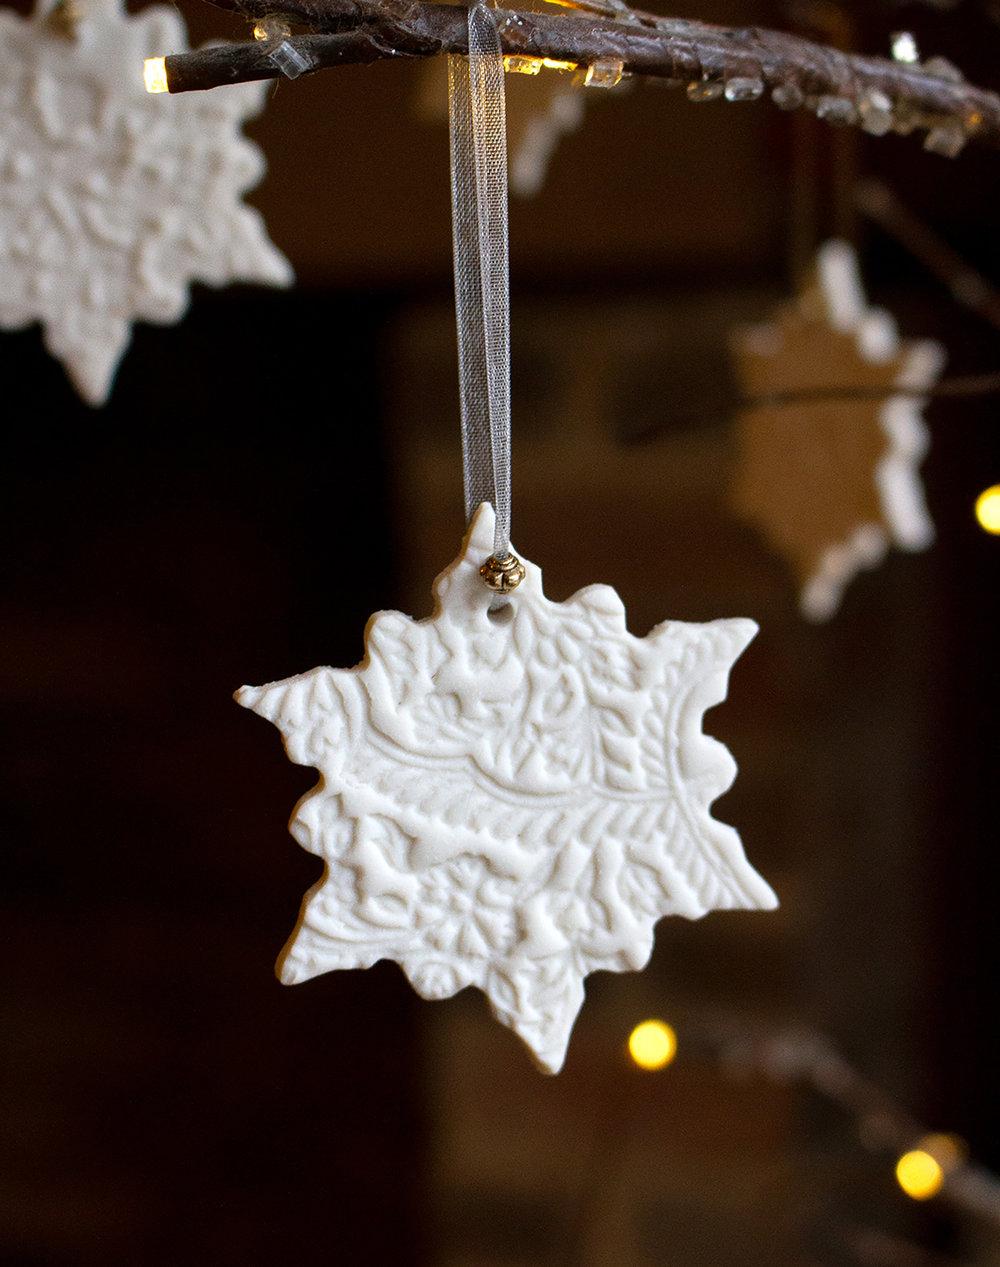 Porcelain snowflake Design 2 closeup.jpg